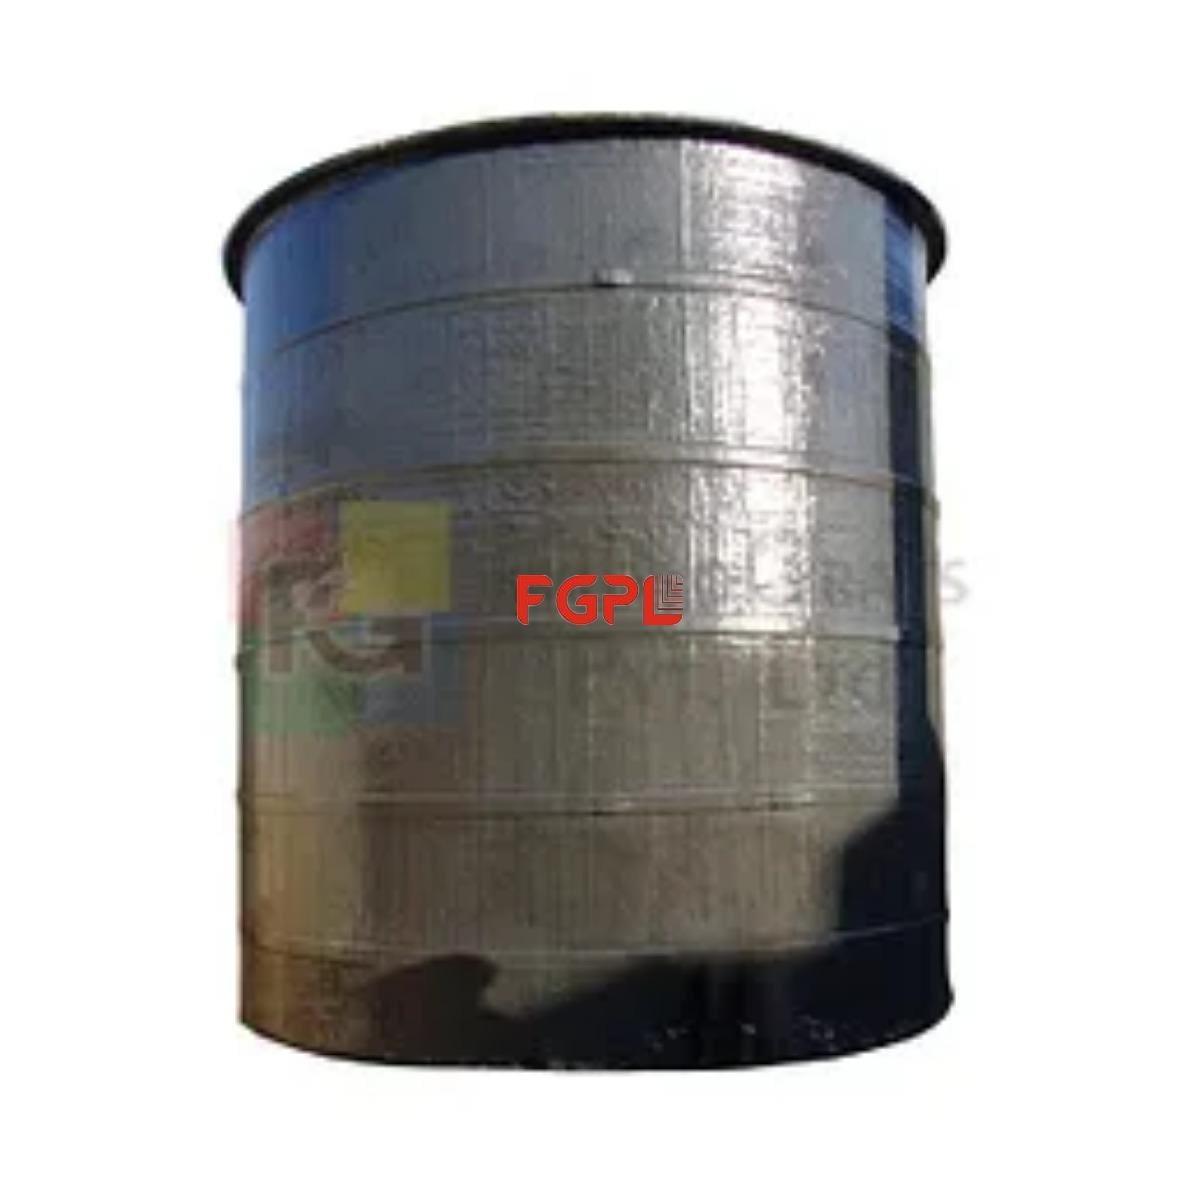 frp storage tank, frp storage tank manufacturer in india